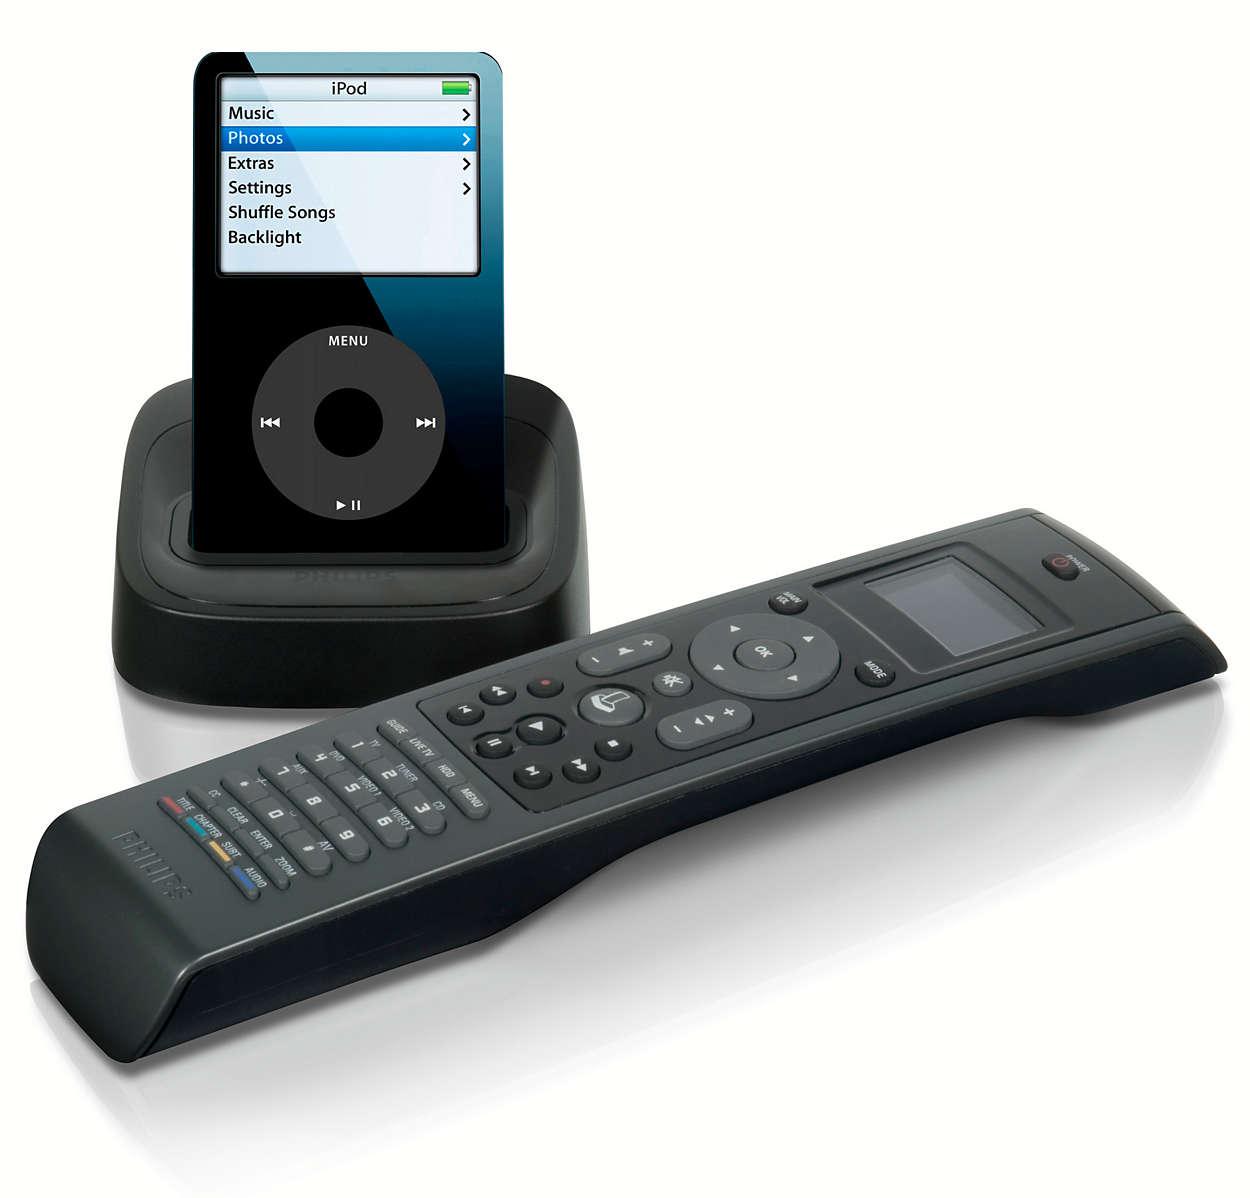 Состояние iPod на экране пульта ДУ